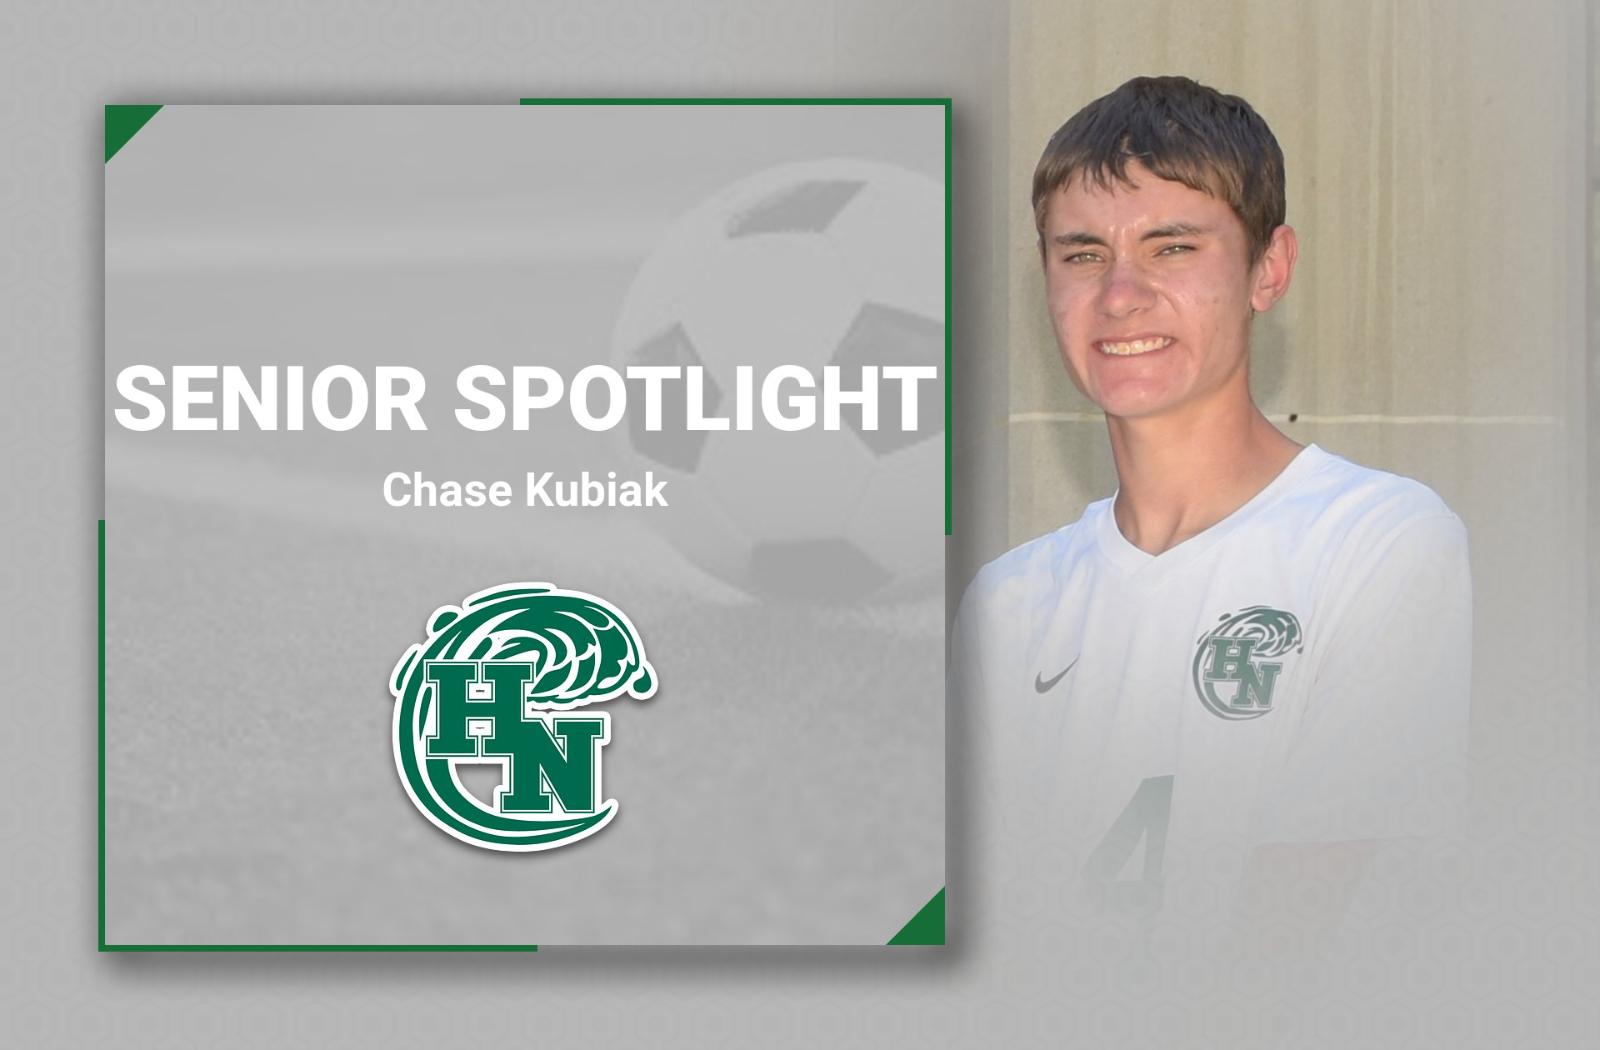 Senior Spotlight – Chase Kubiak